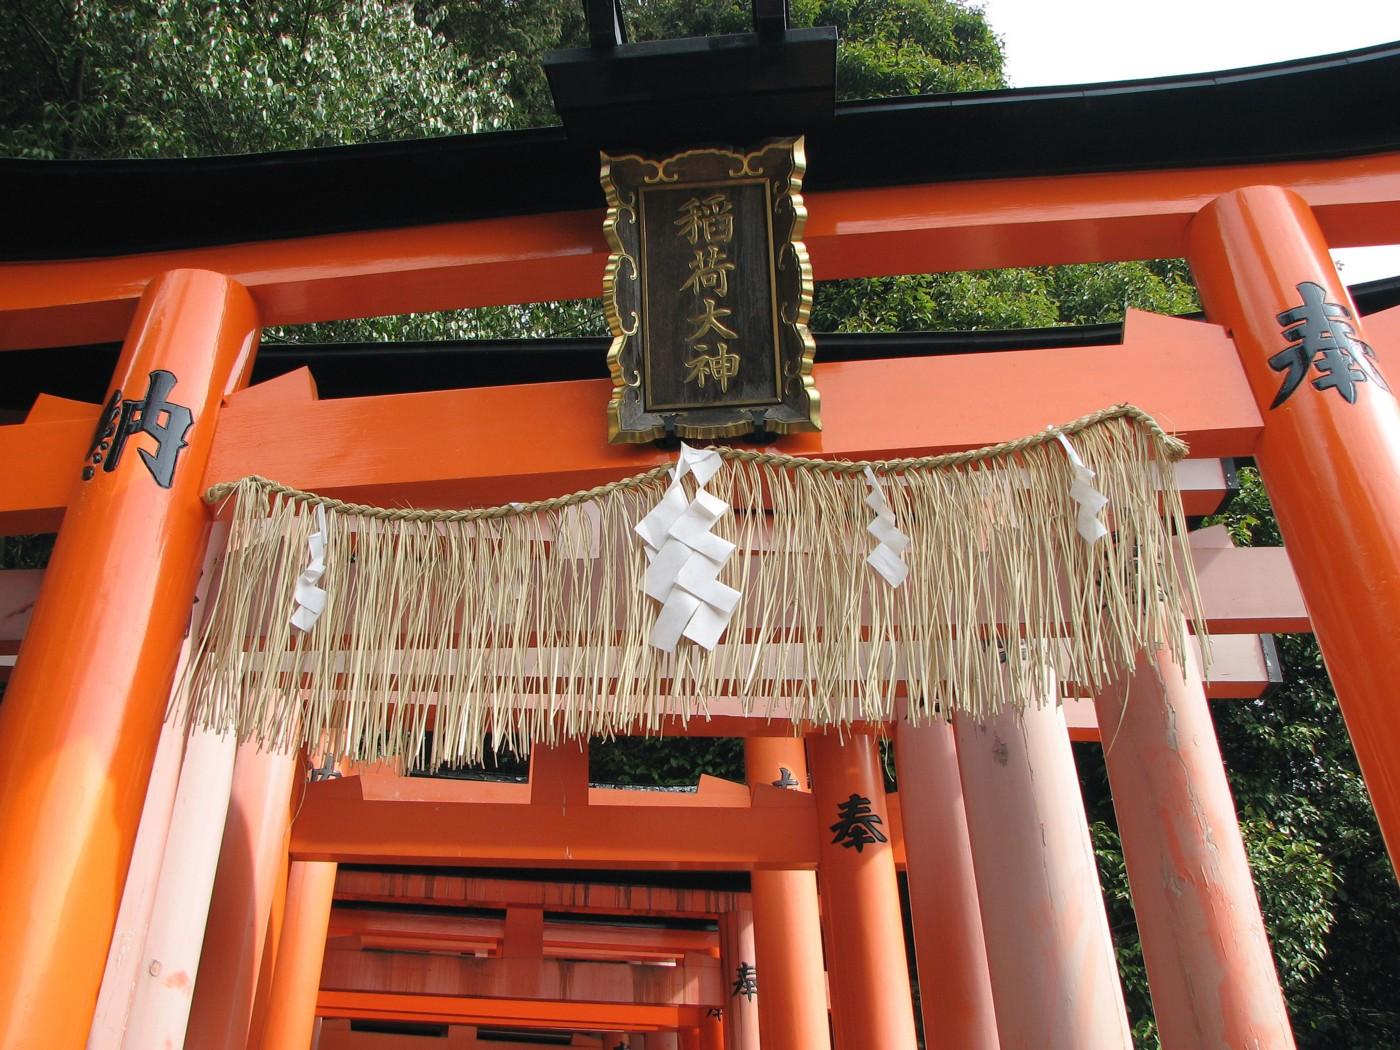 Fushimi Inari Taisha 伏見稲荷大社 鳥居 Shimenawa gohei